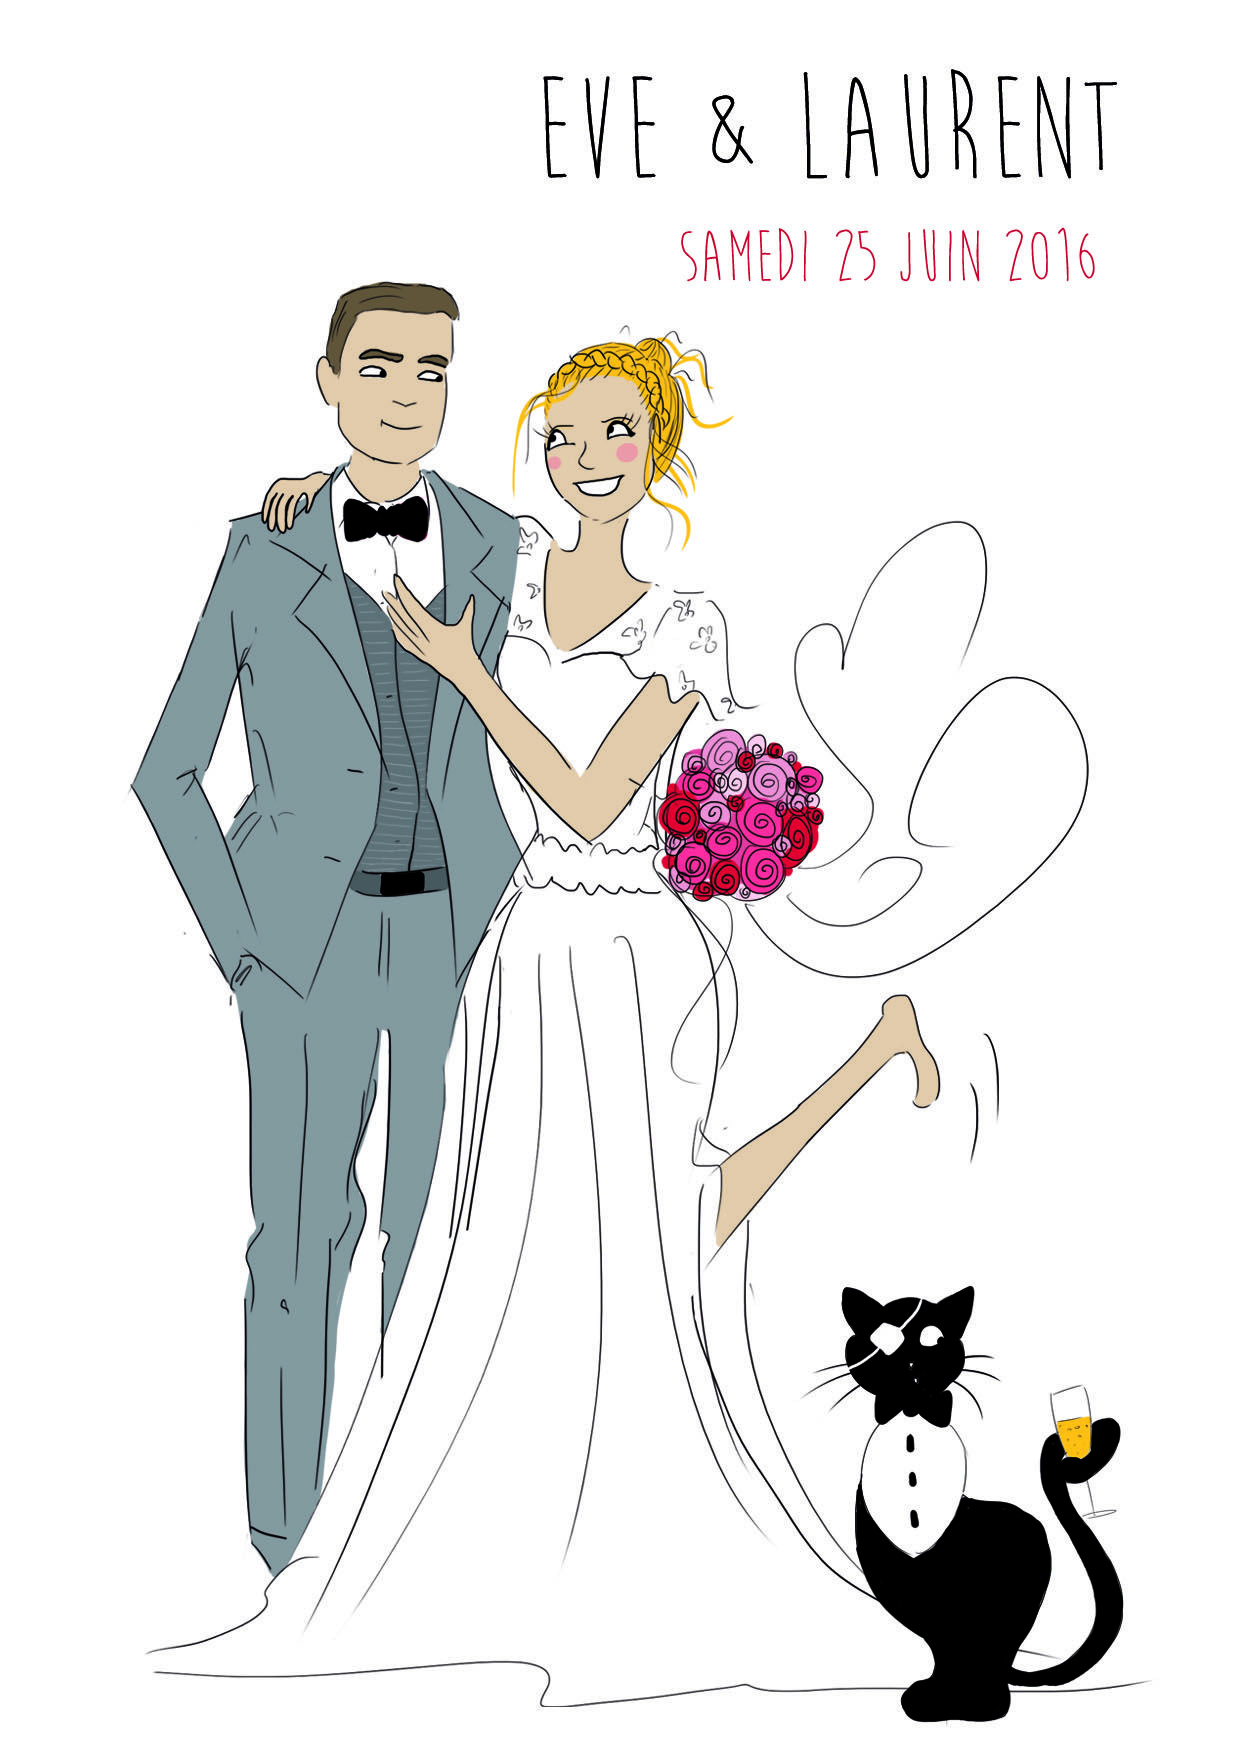 fairepart announcement mariage wedding chat cat classe chic - Dessin Mariage